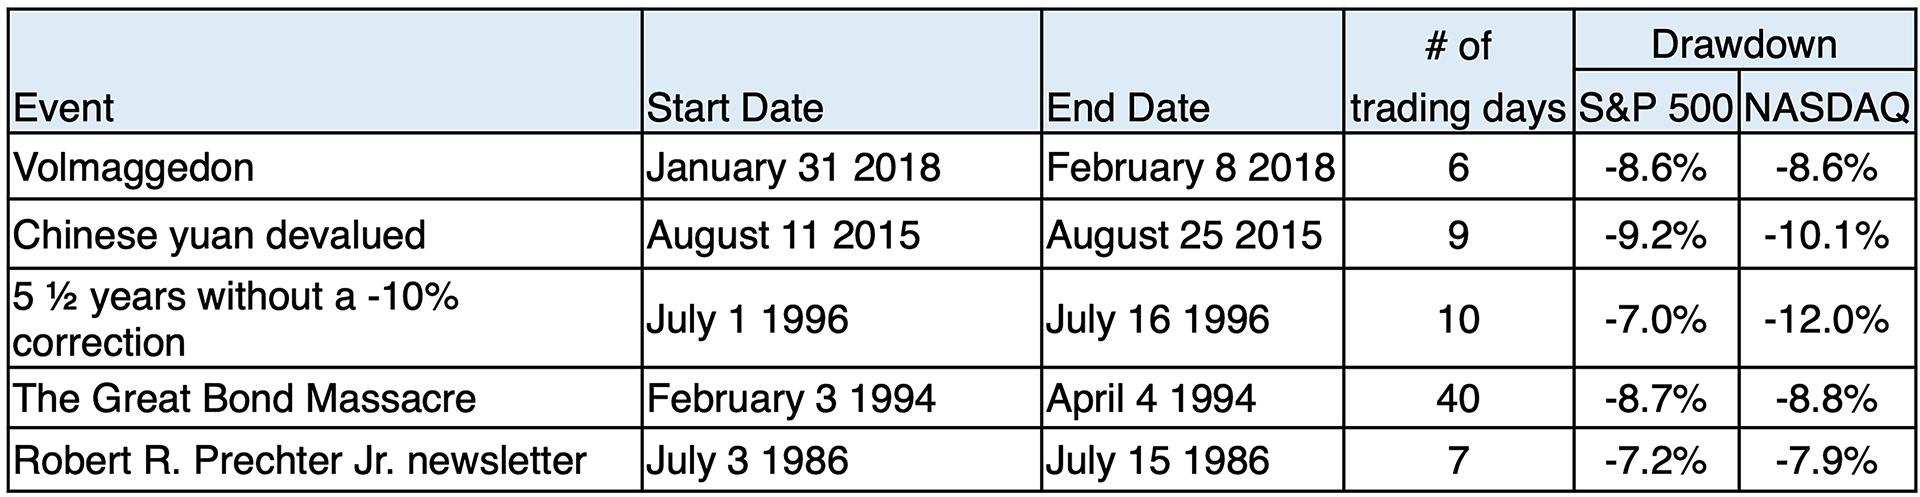 Drawdown of 5 events